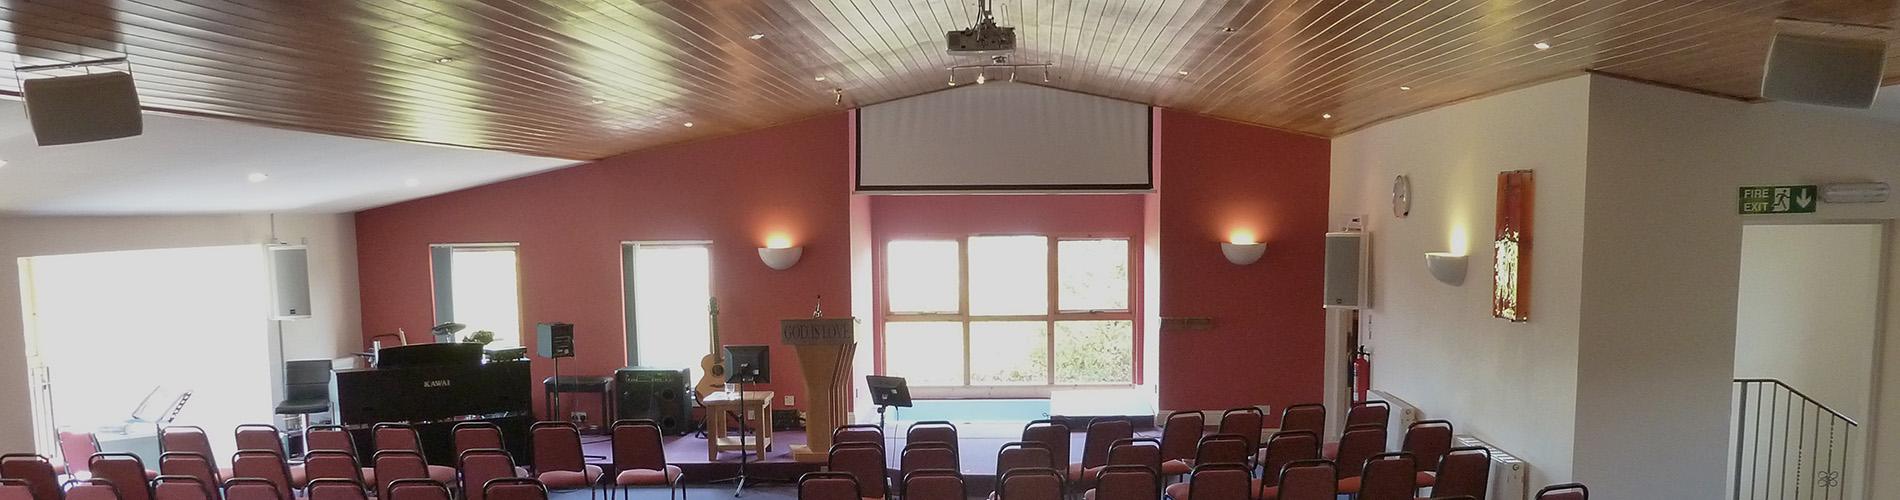 Craigalbert Church, Cumbernauld.